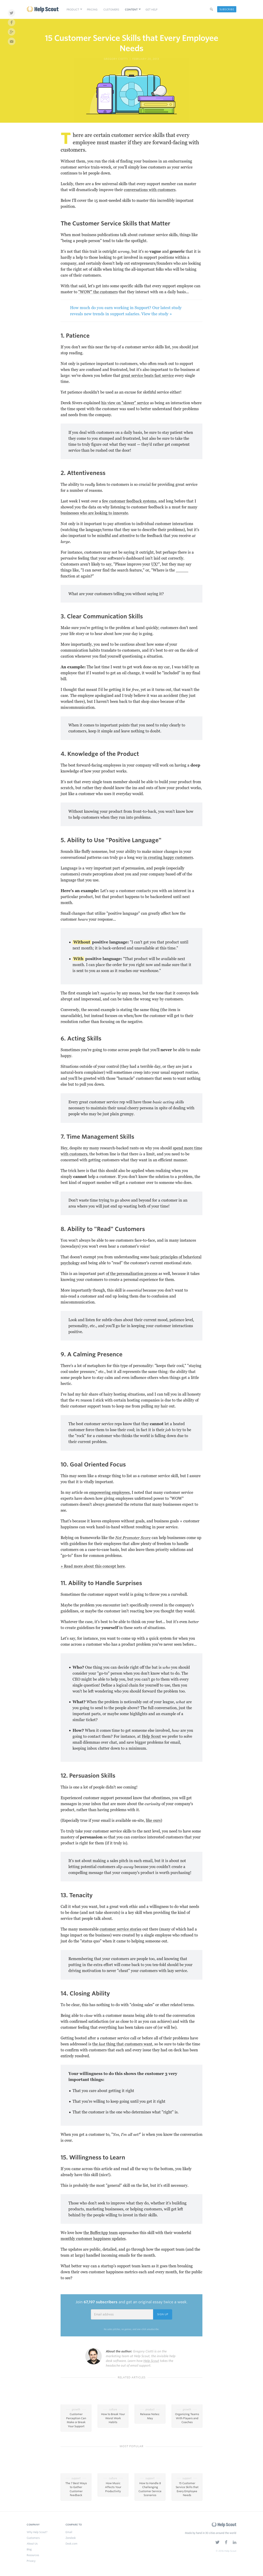 15 Customer Service Skills that Every Employee NeedsHelp Scout logo